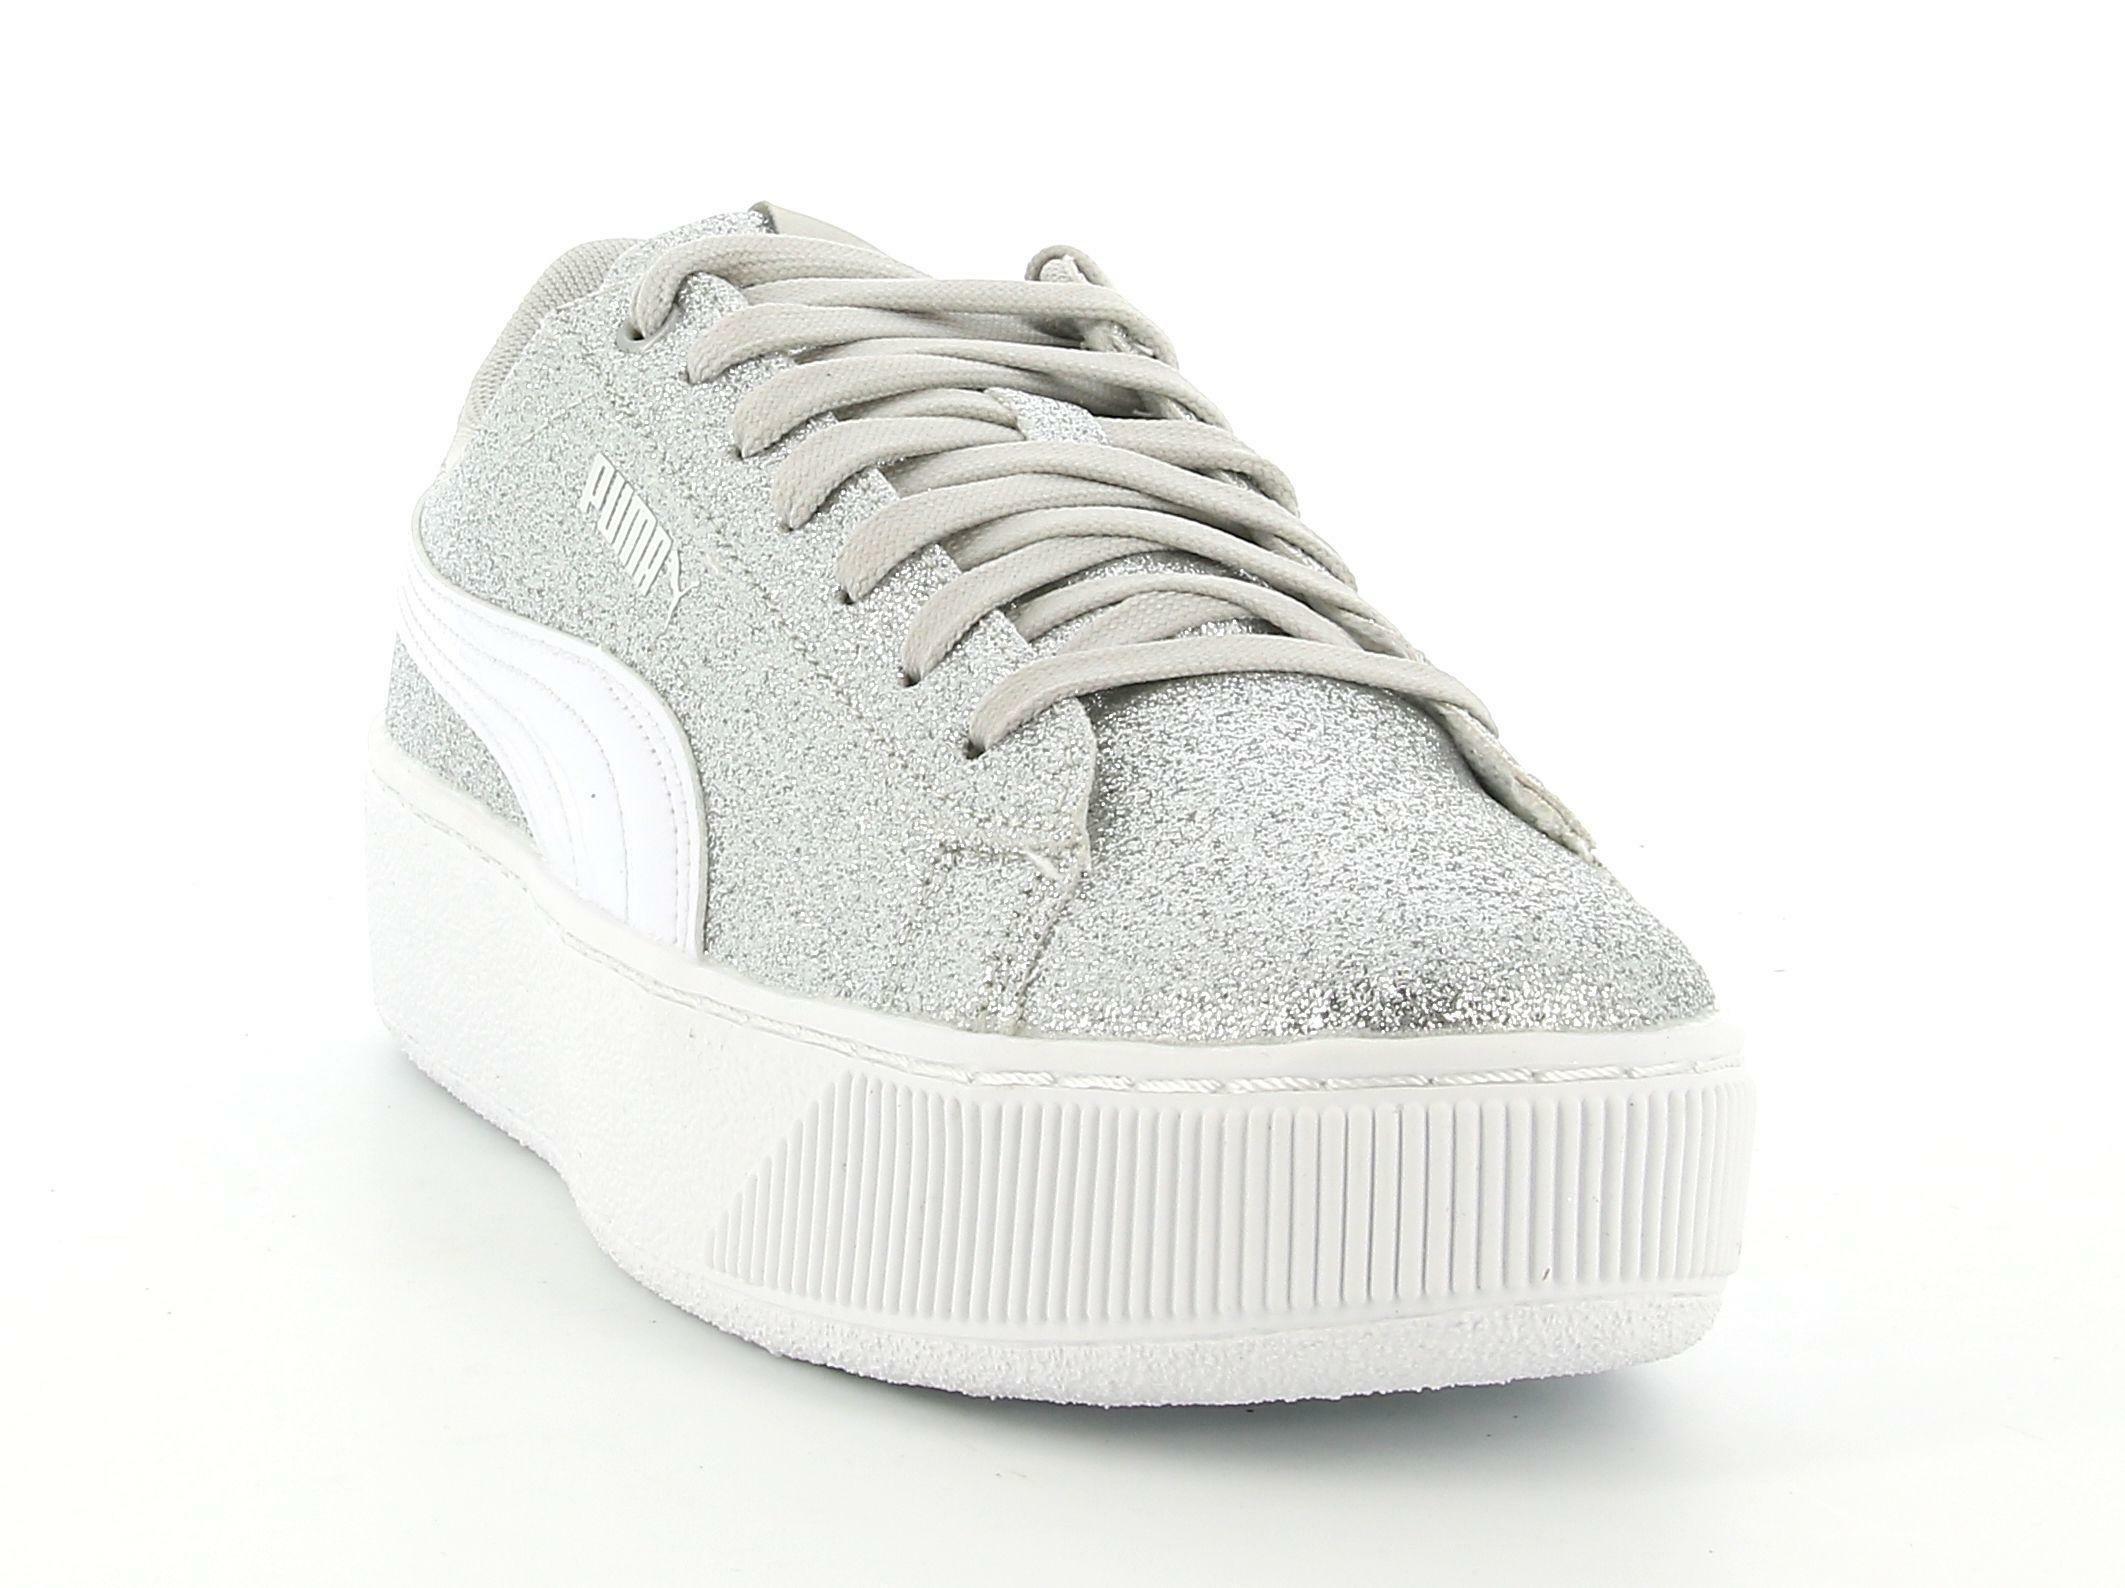 puma puma vikky platform glitz jr 366856 012 sneaker ragazza argento